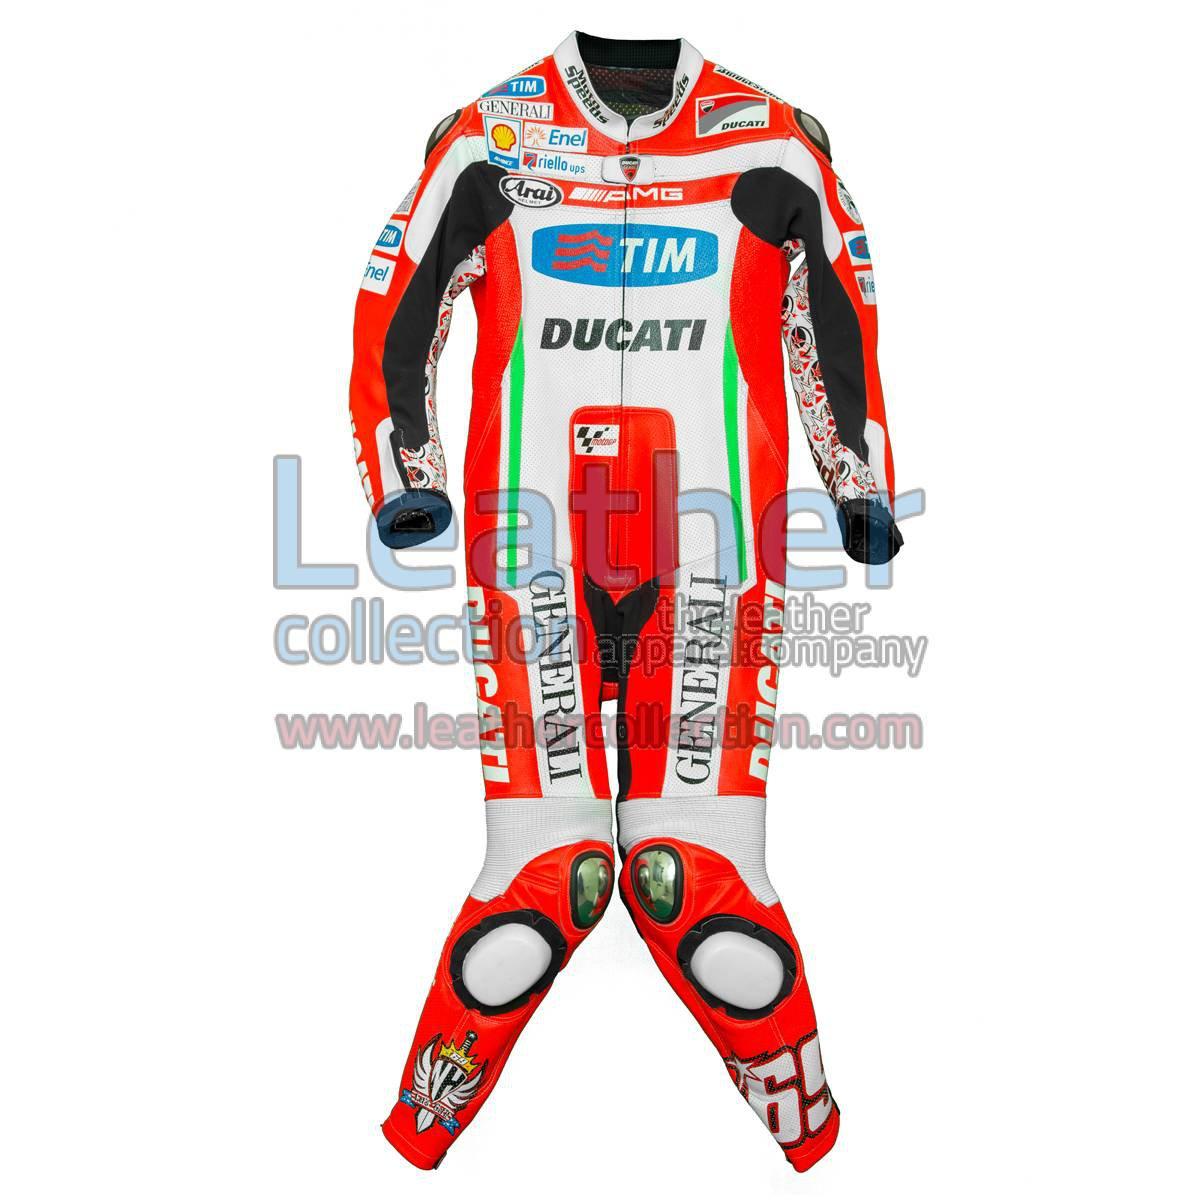 Nicky Hayden 2012 MotoGP Race Leathers